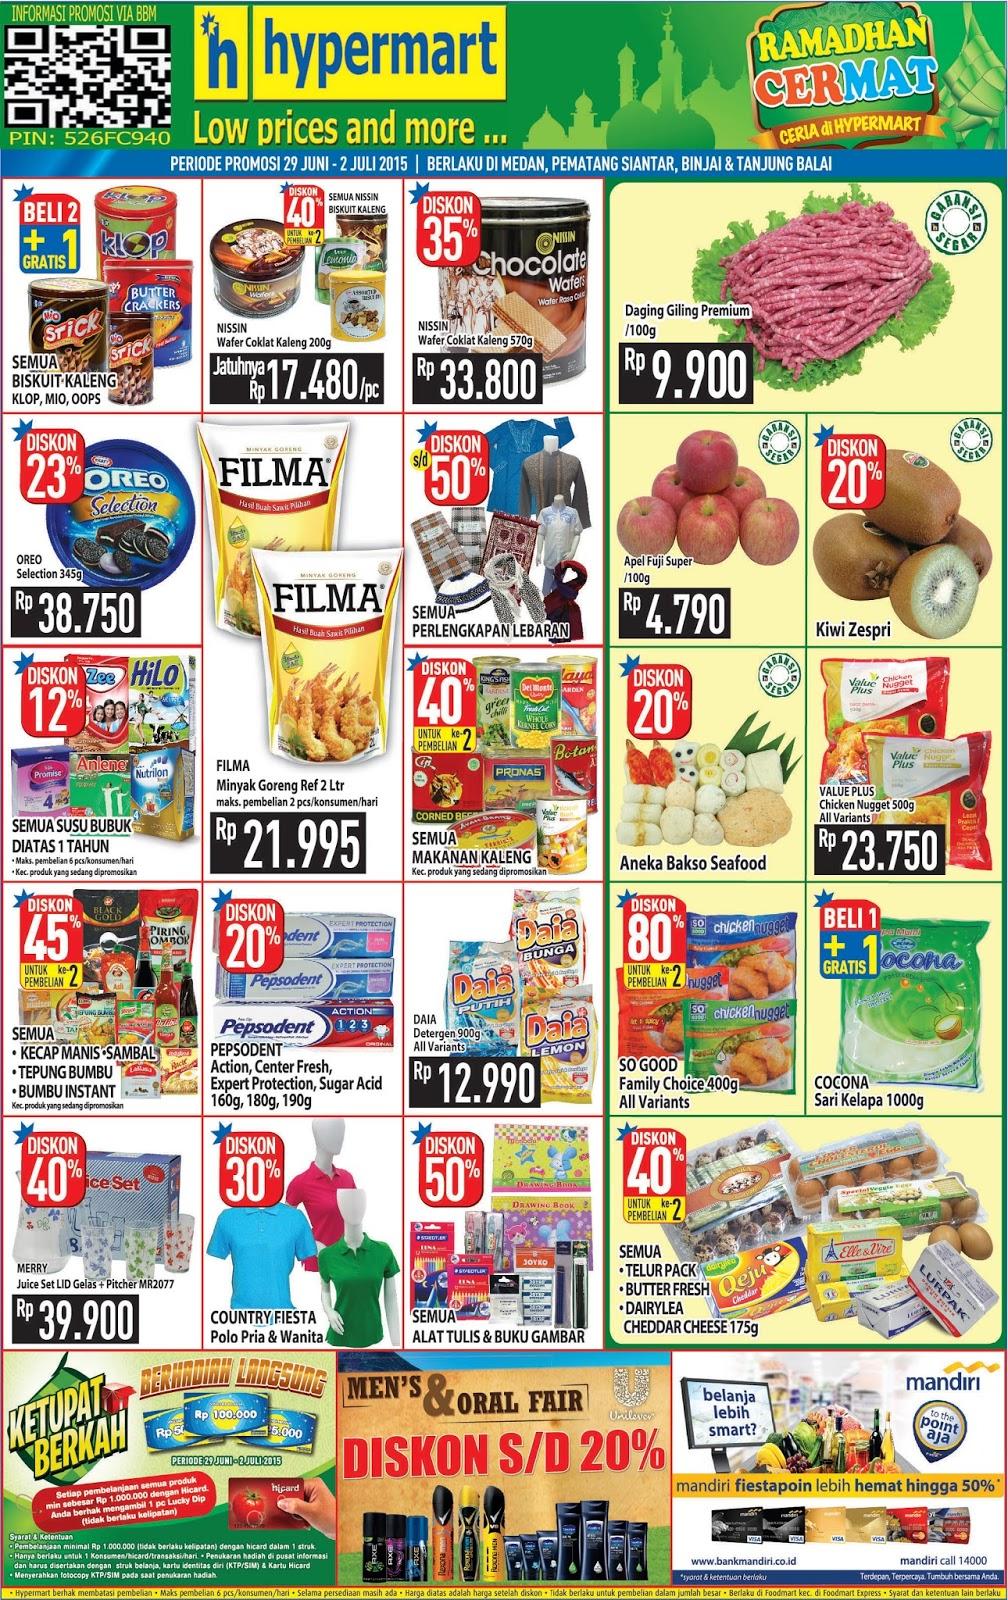 Promo Hypermart Tj Balai 2015 Heboh 3 Pack My Baby Minyak Telon Plus 90 Ml Value Chicken Nugget 500g All Variant Rp 23750 Diskon 45 Pembelian Ke 2 Semua Kecap Manis Sambal Tepung Bumbu Instant